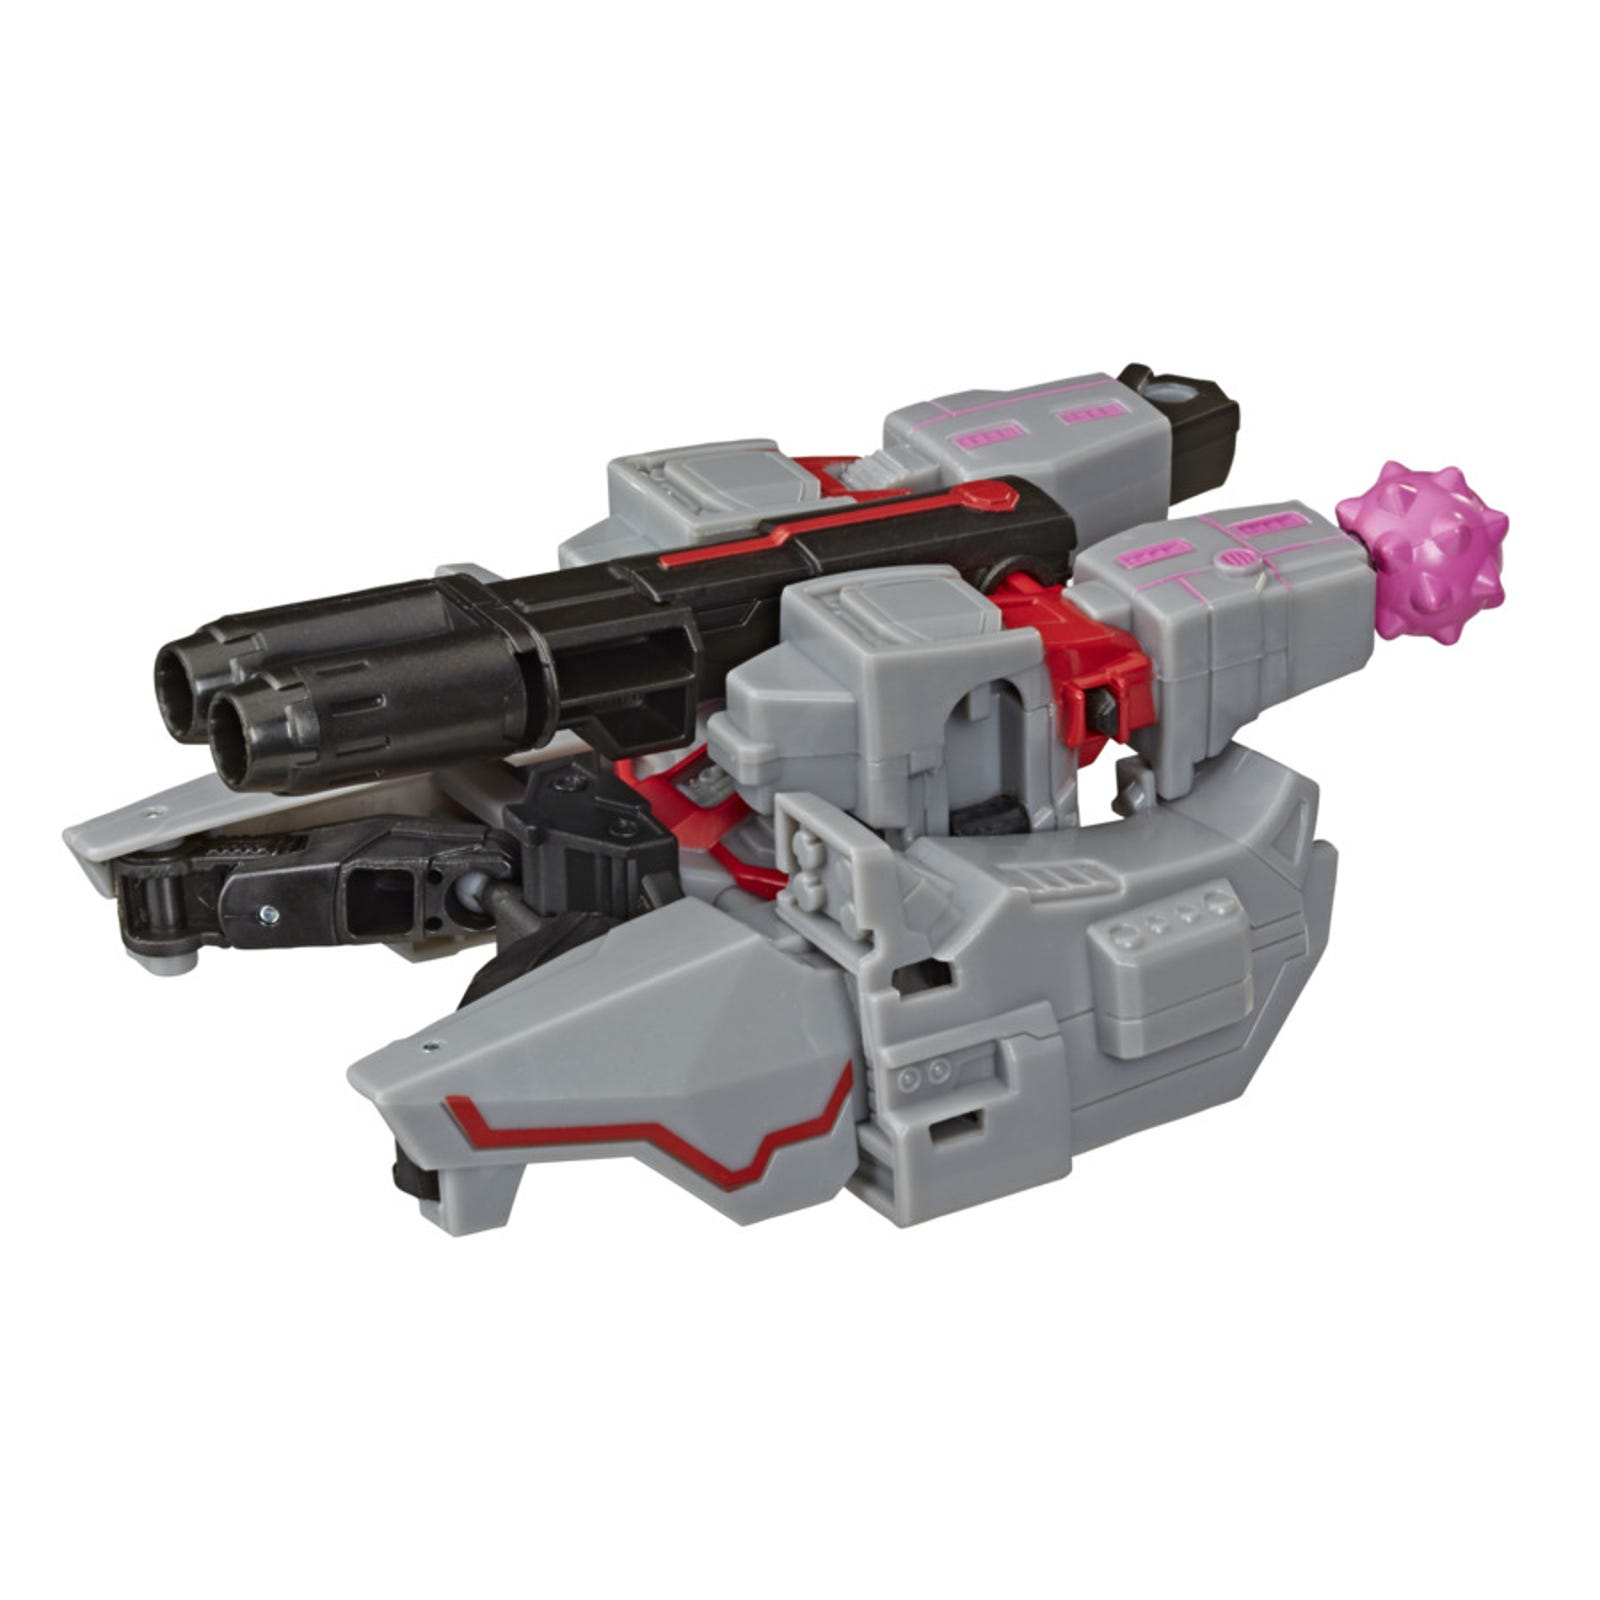 Cybertronian Warrior Megatron